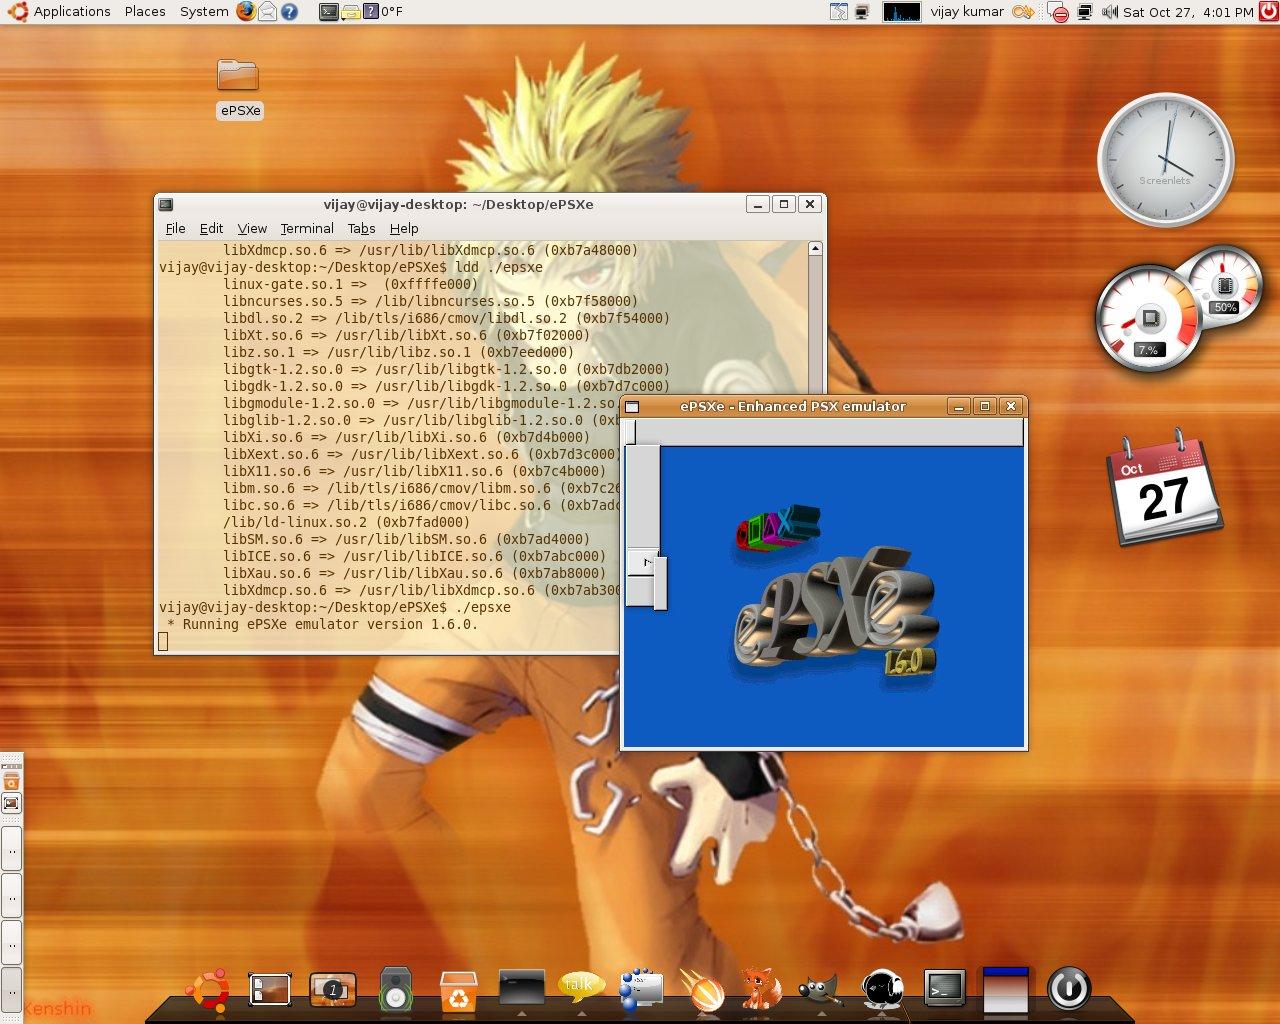 Install ePSXe Playstation Emulator - Page 18